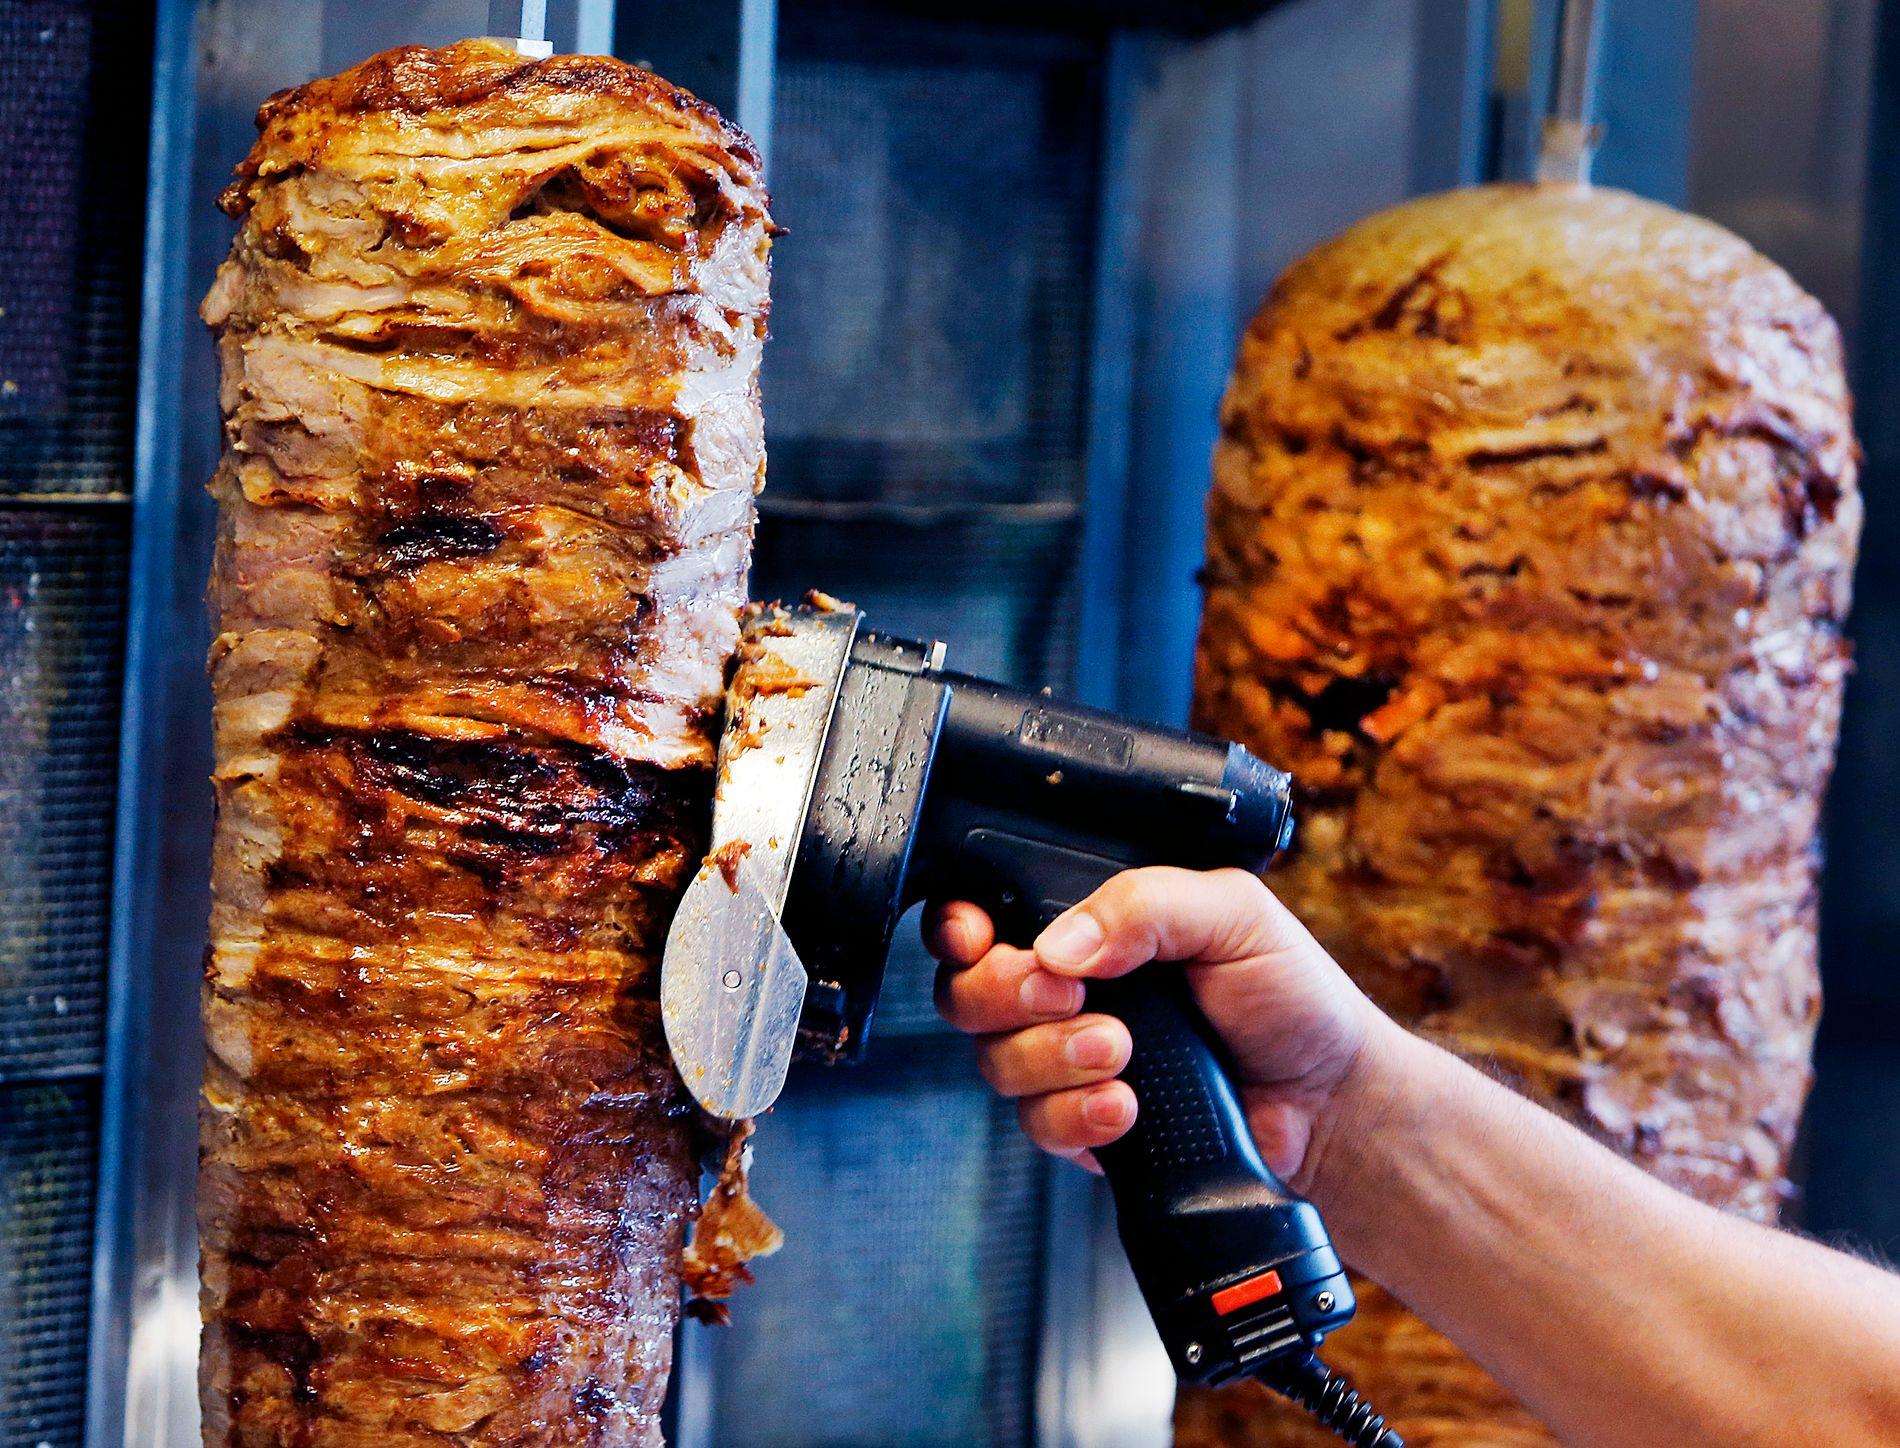 KEBAB: Her skjærer en mann kebab på en kafé i Frankfurt.